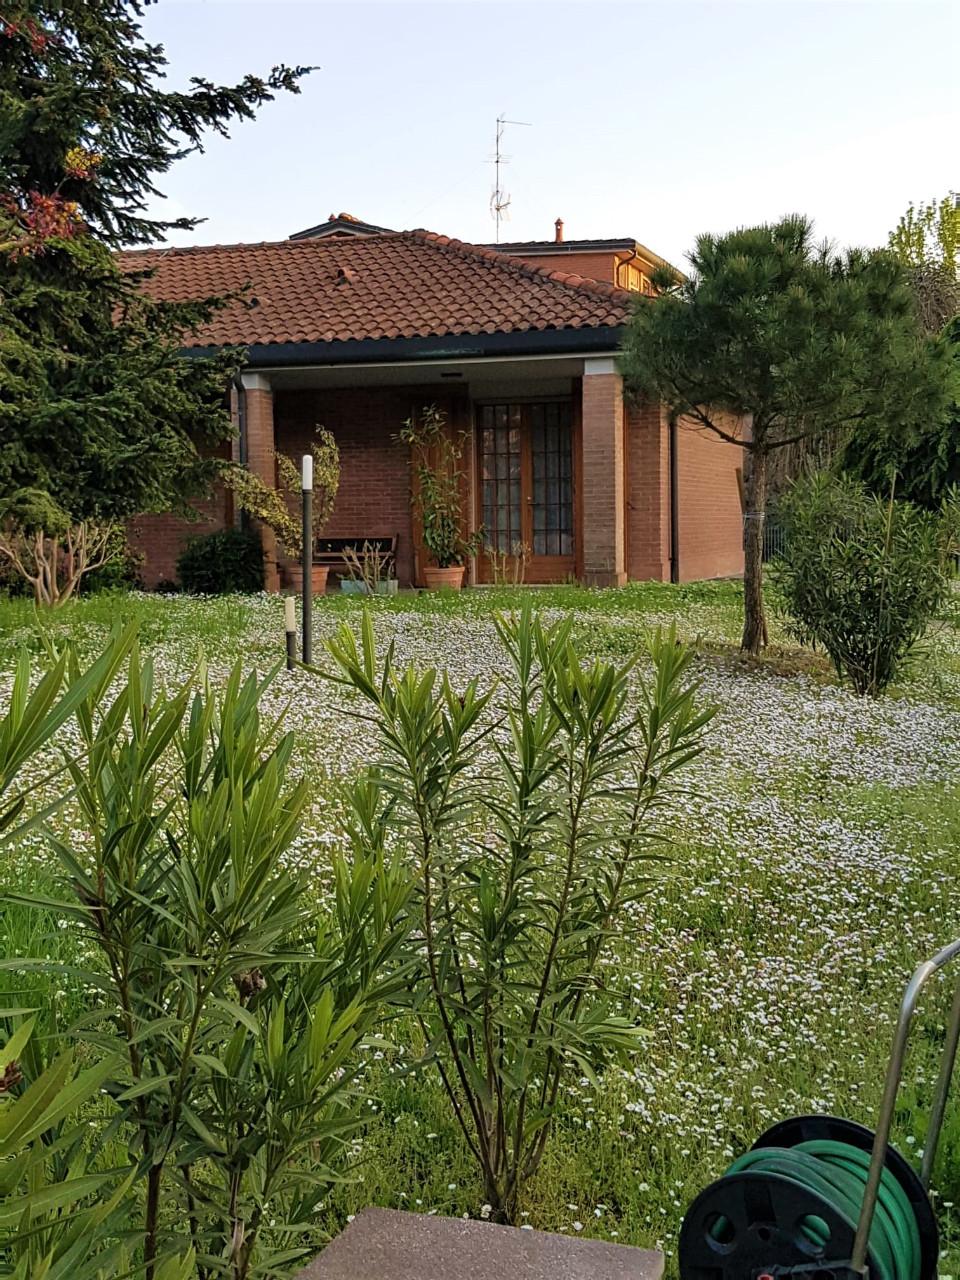 Villa Indipendente in vendita Ferrara Zona Pontelagoscuro